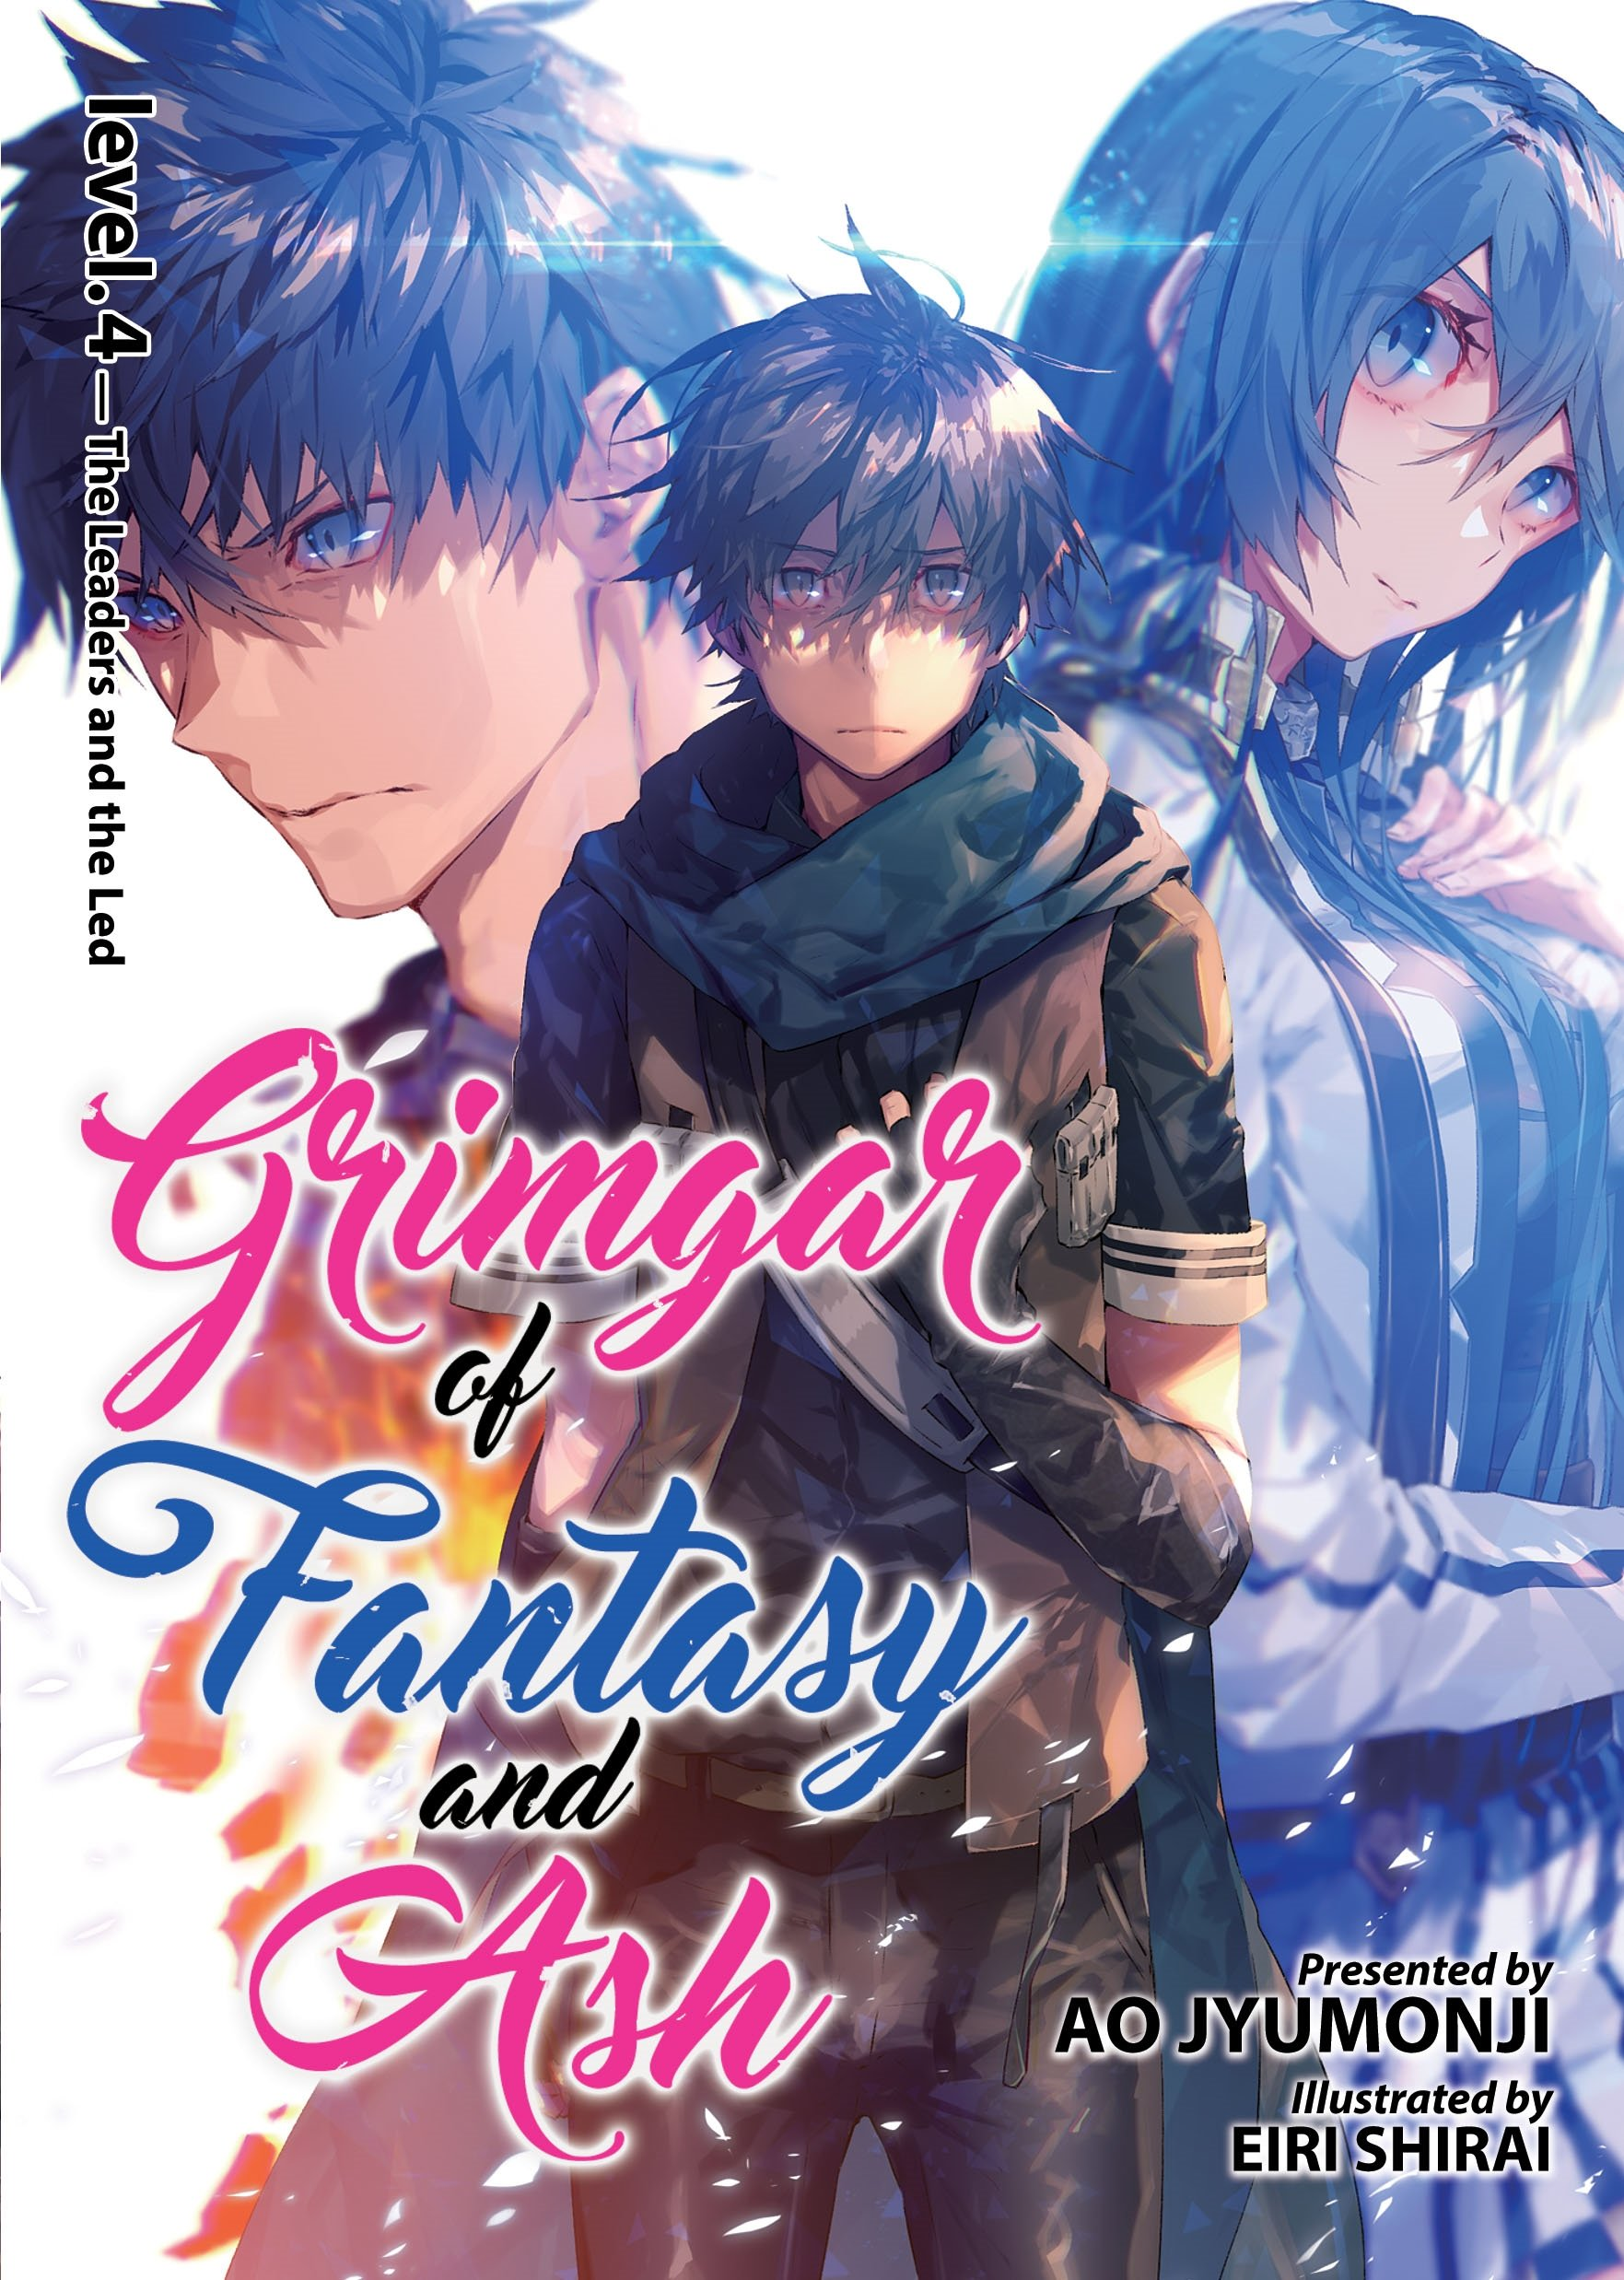 Grimgar of Fantasy and Ash: Light Novel Vol. 4 (Grimgar of Fantasy and Ash, Level 4, Band 4)